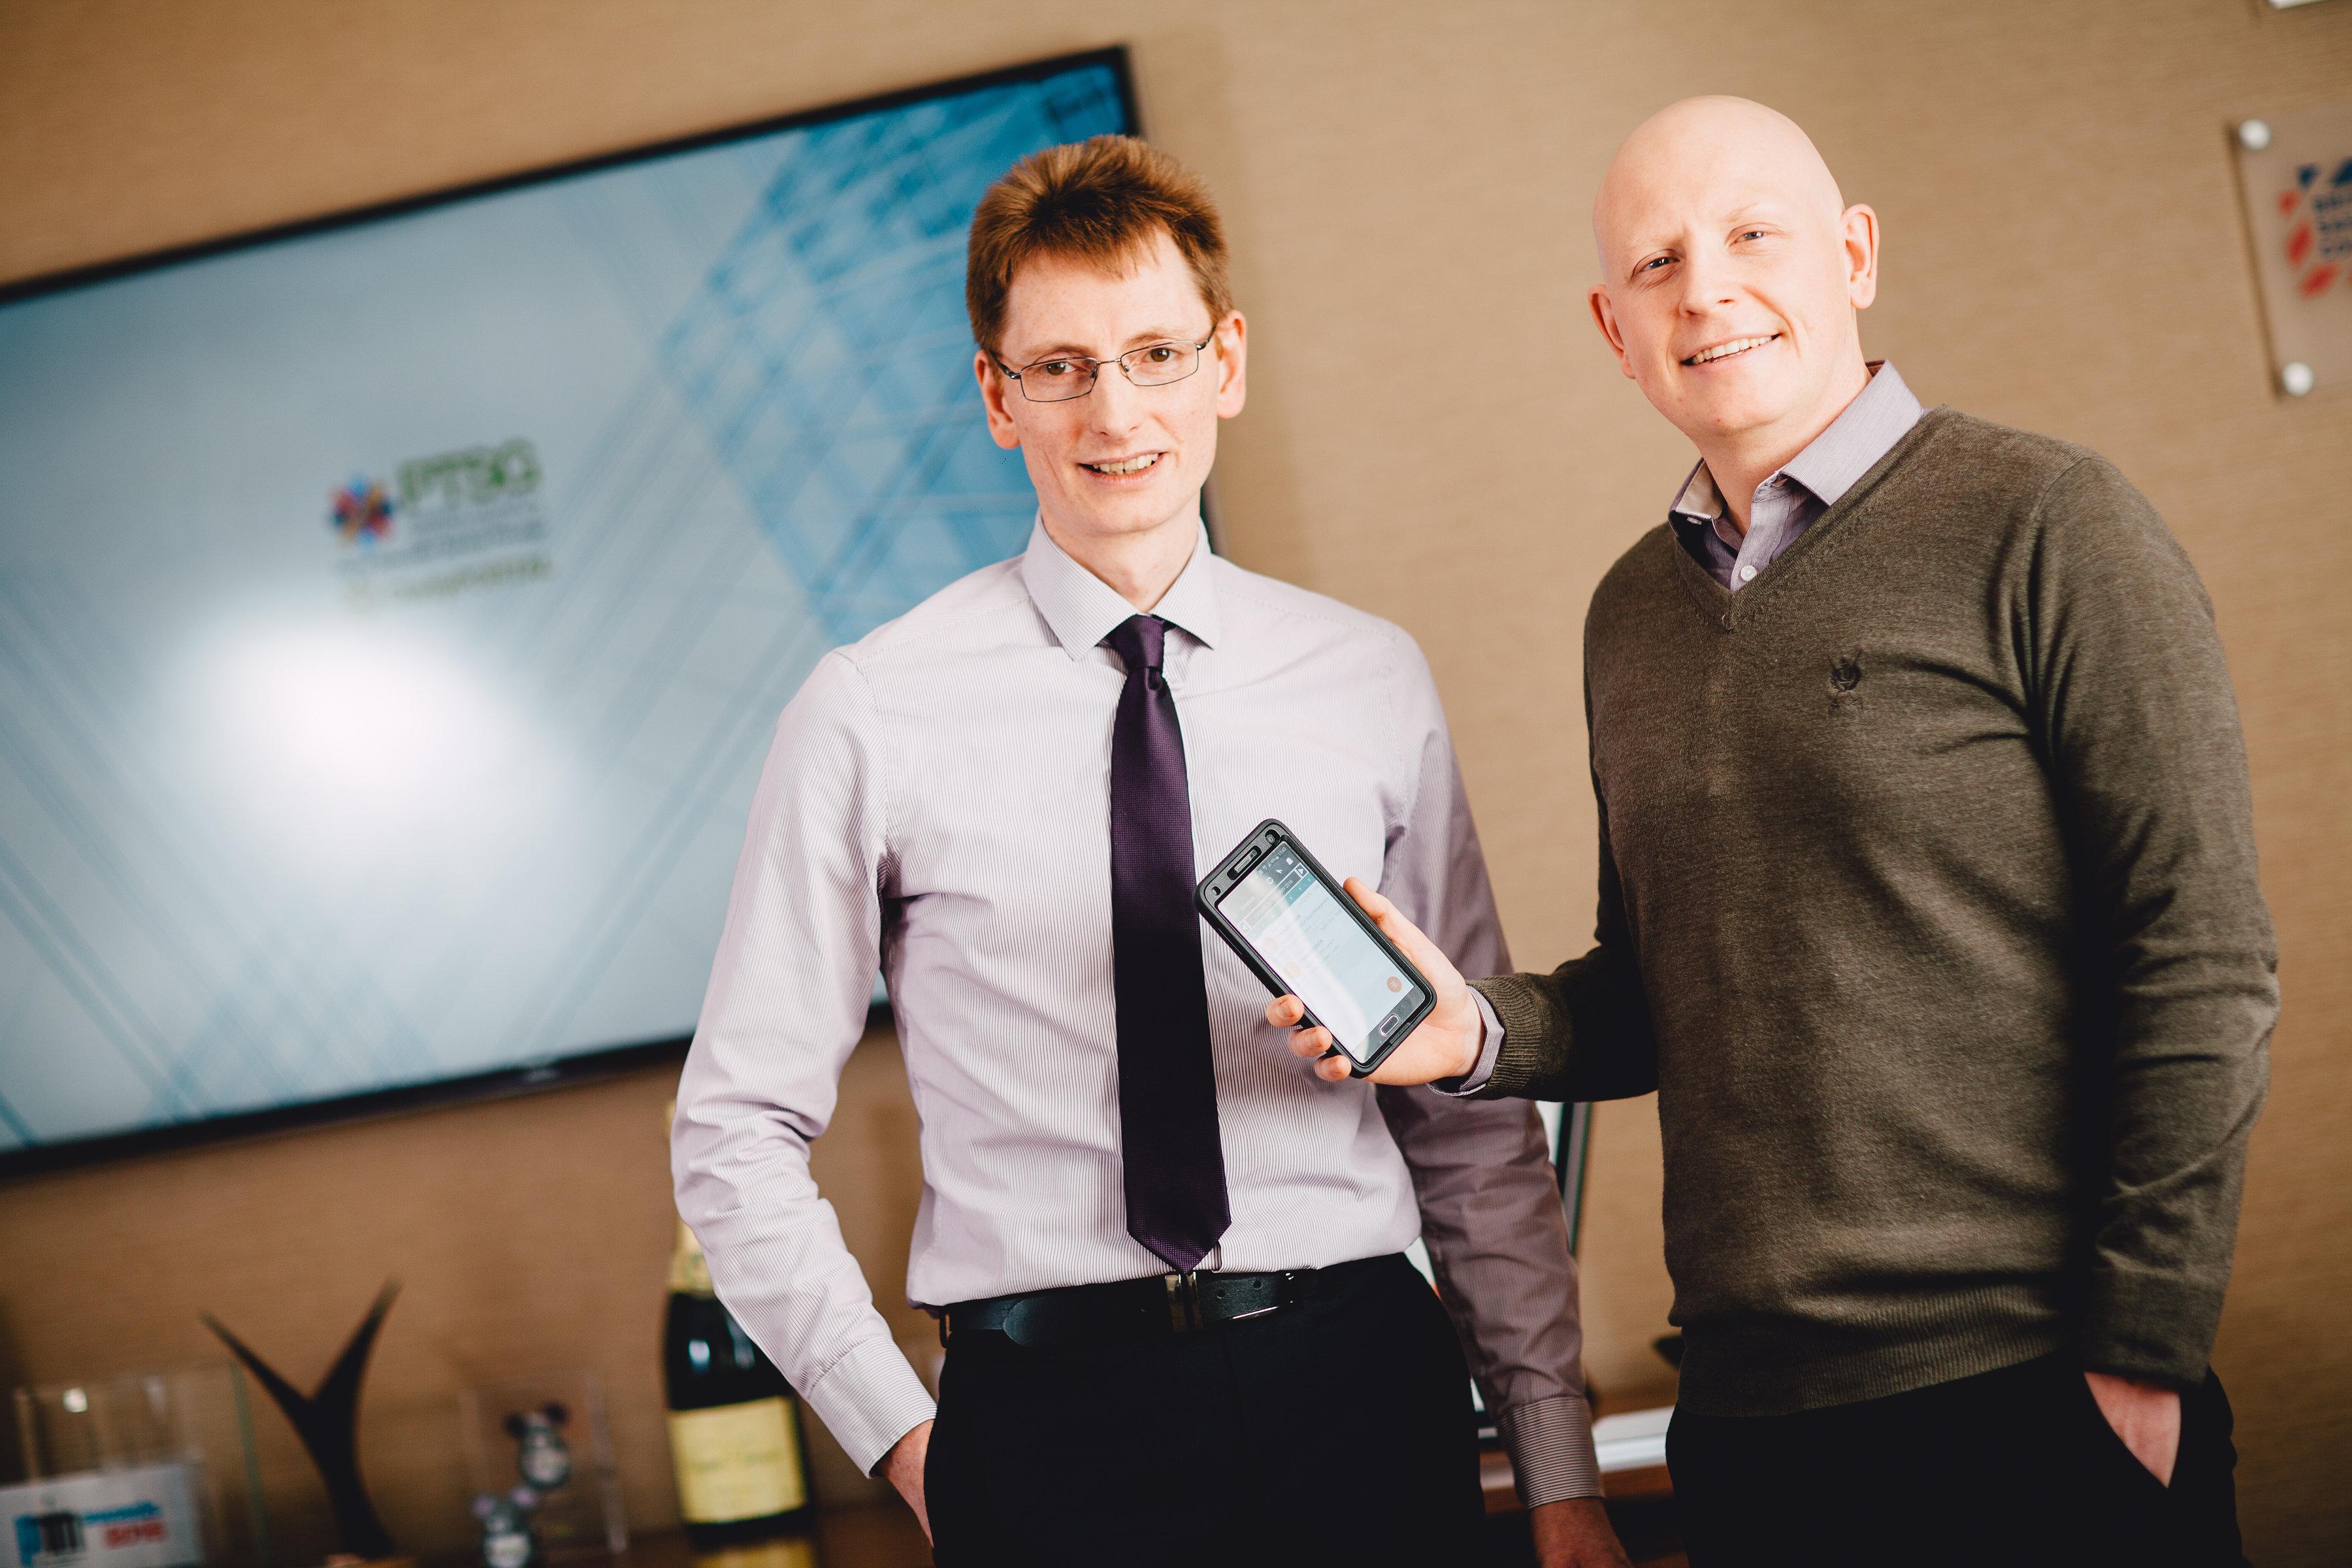 PTSG's software development team, Chris Cook and Simon Wainwright